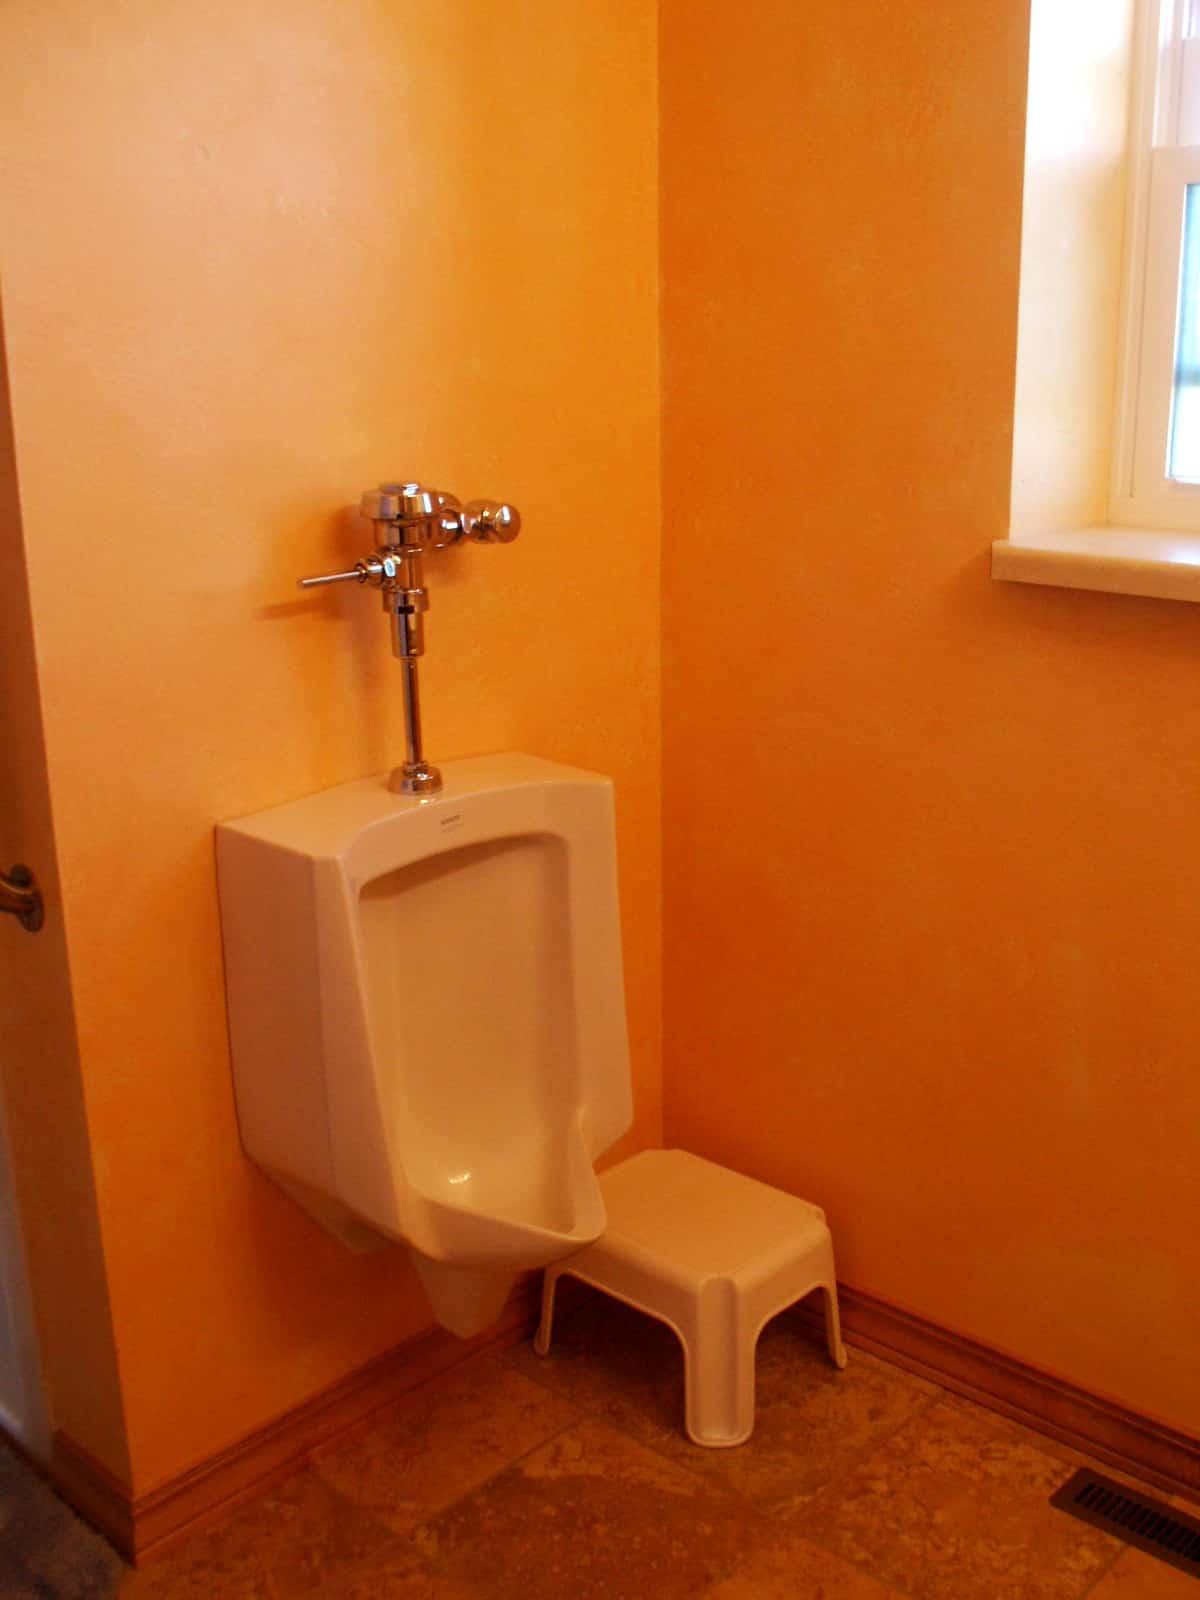 Bathroom Urinal: Common Sense Homesteading